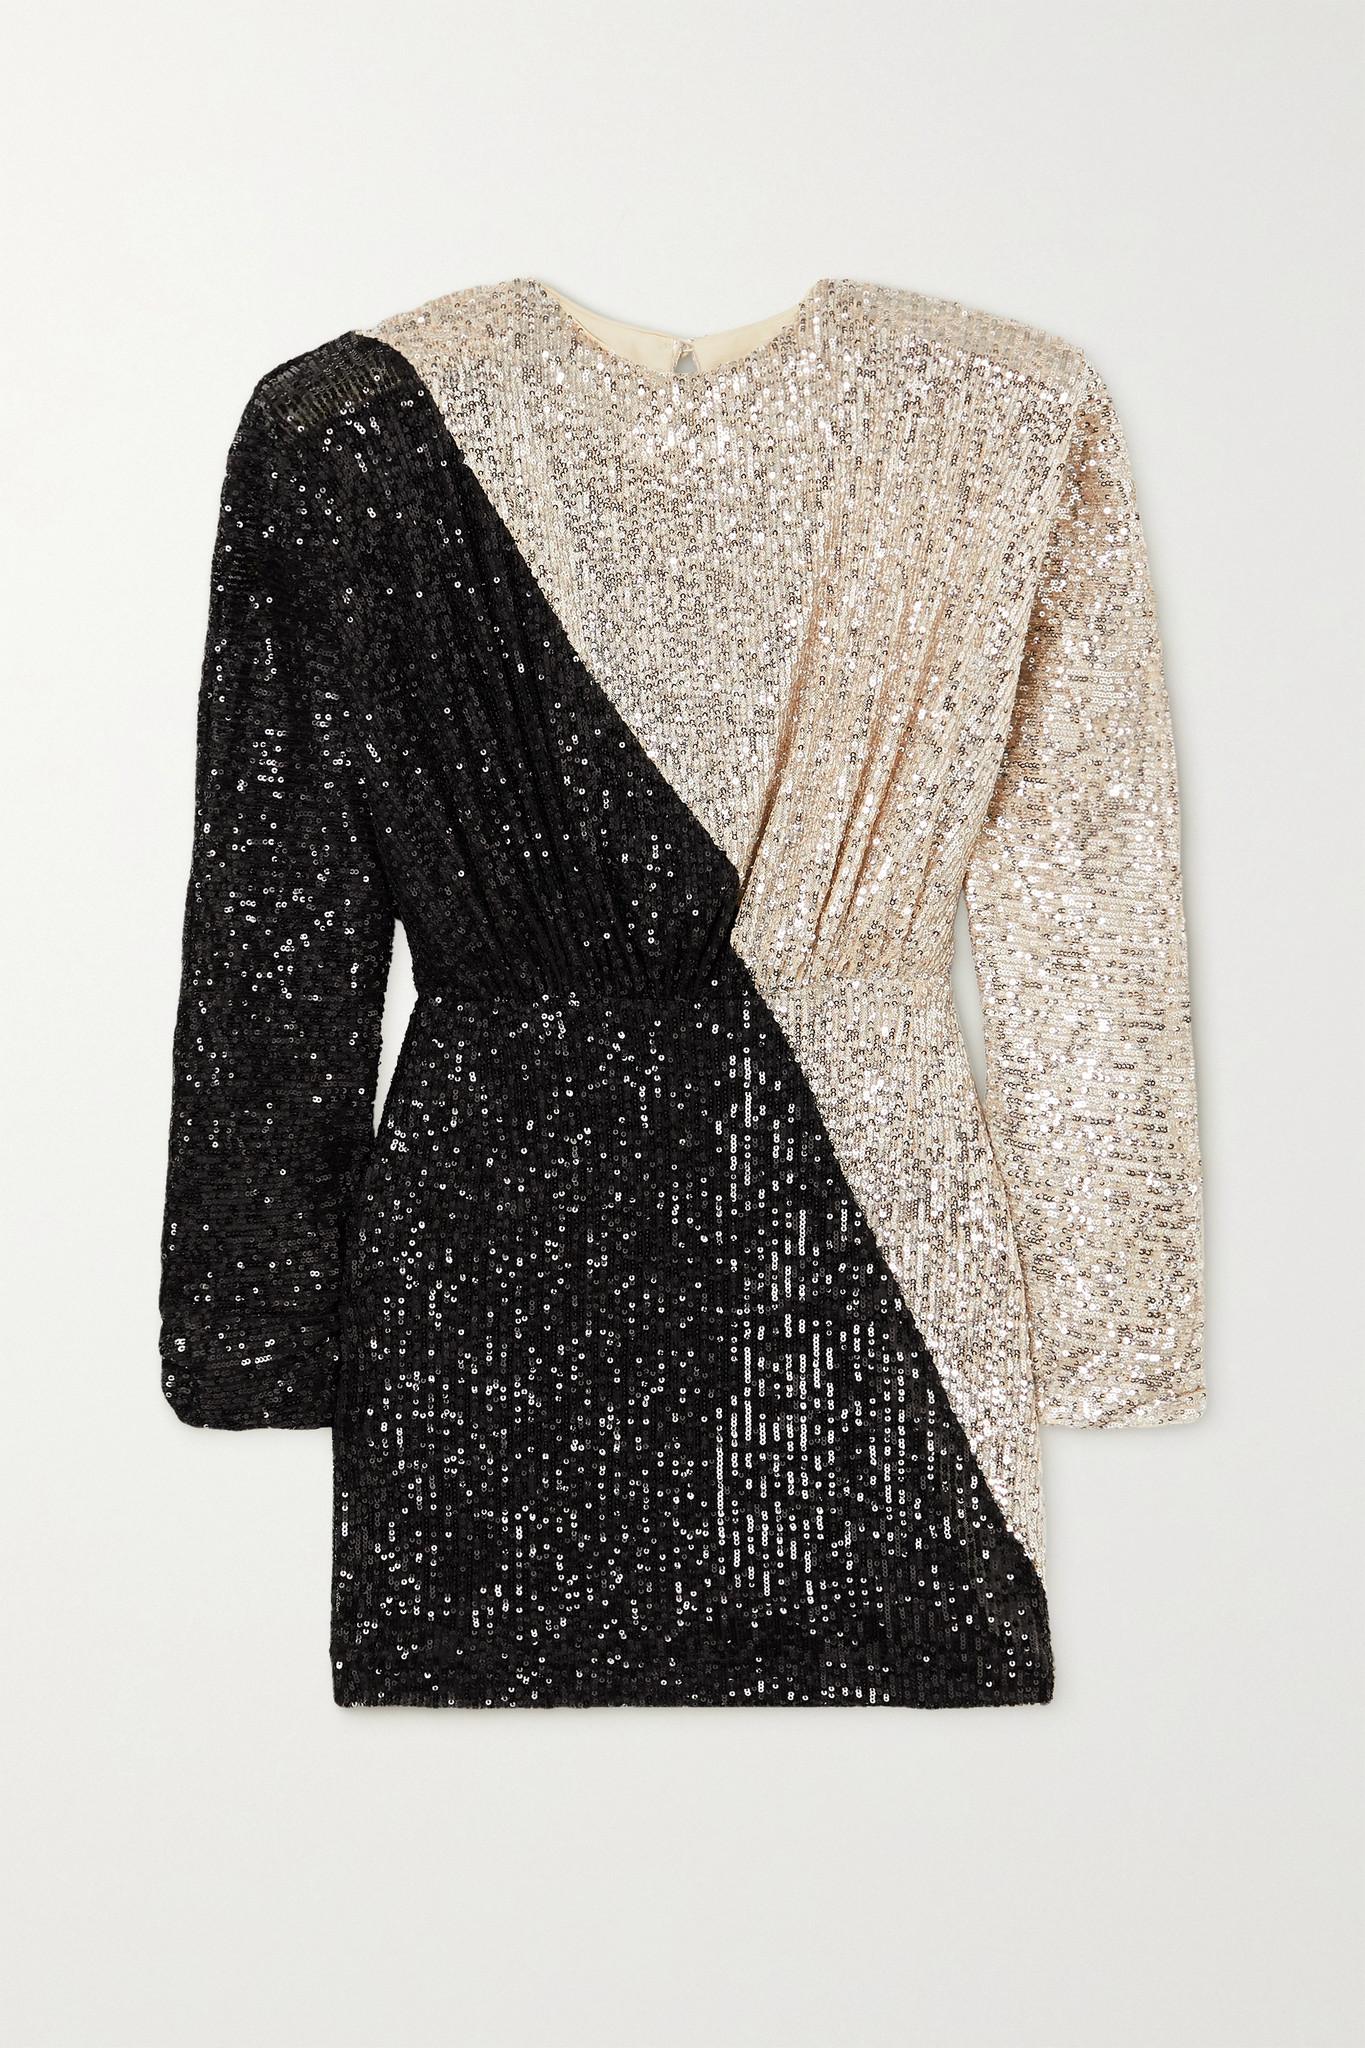 ROTATE BIRGER CHRISTENSEN - Billie Two-tone Sequined Stretch-knit Mini Dress - Silver - DK36